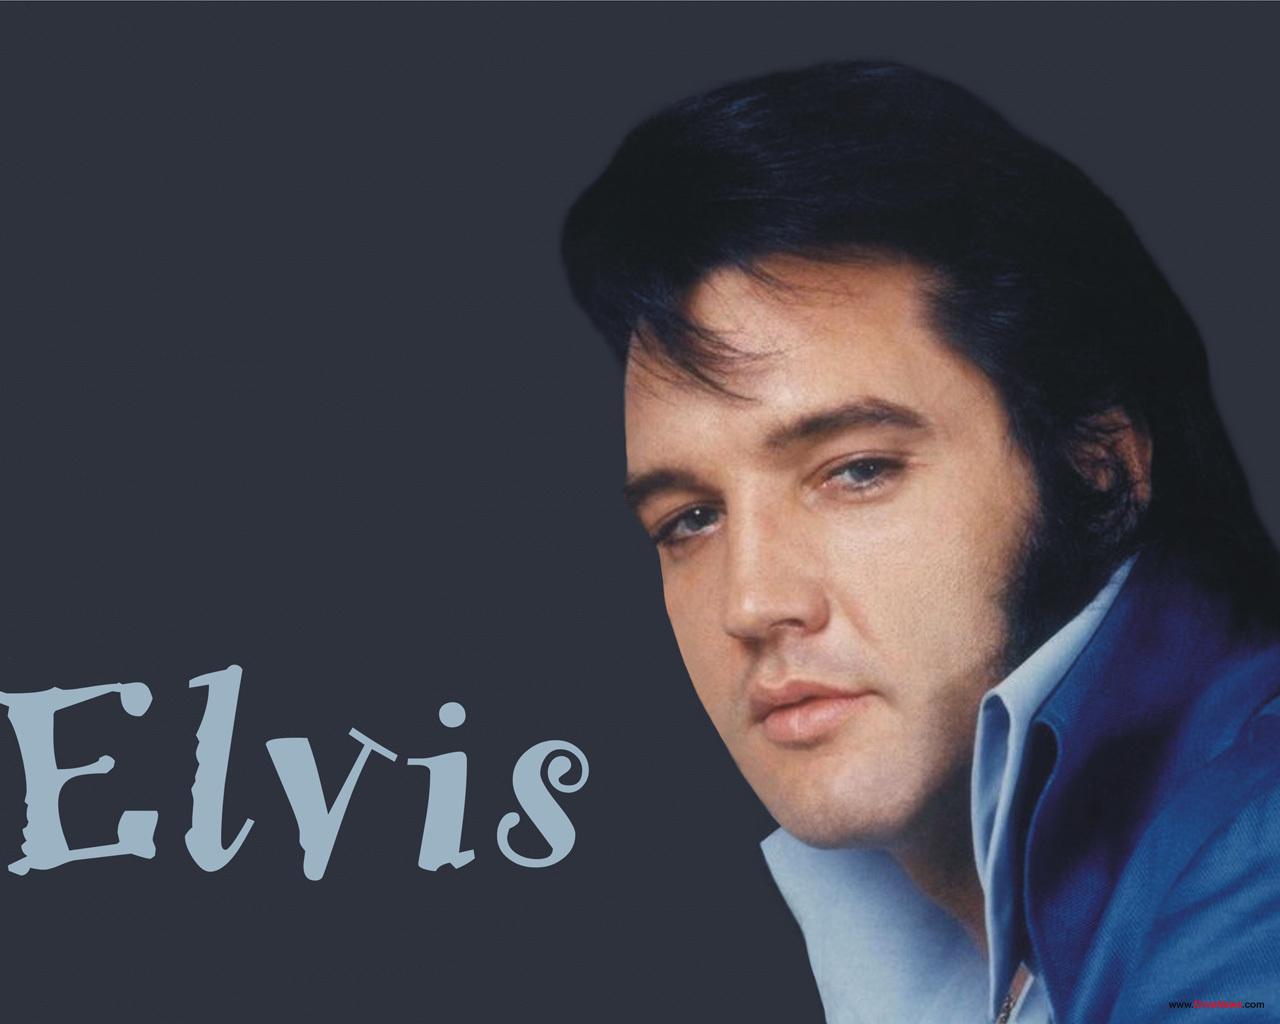 Killzone Shadow Fall Iphone 5 Wallpaper Wallpapers Hd 54 Wallpapers De Elvis Presley Varias